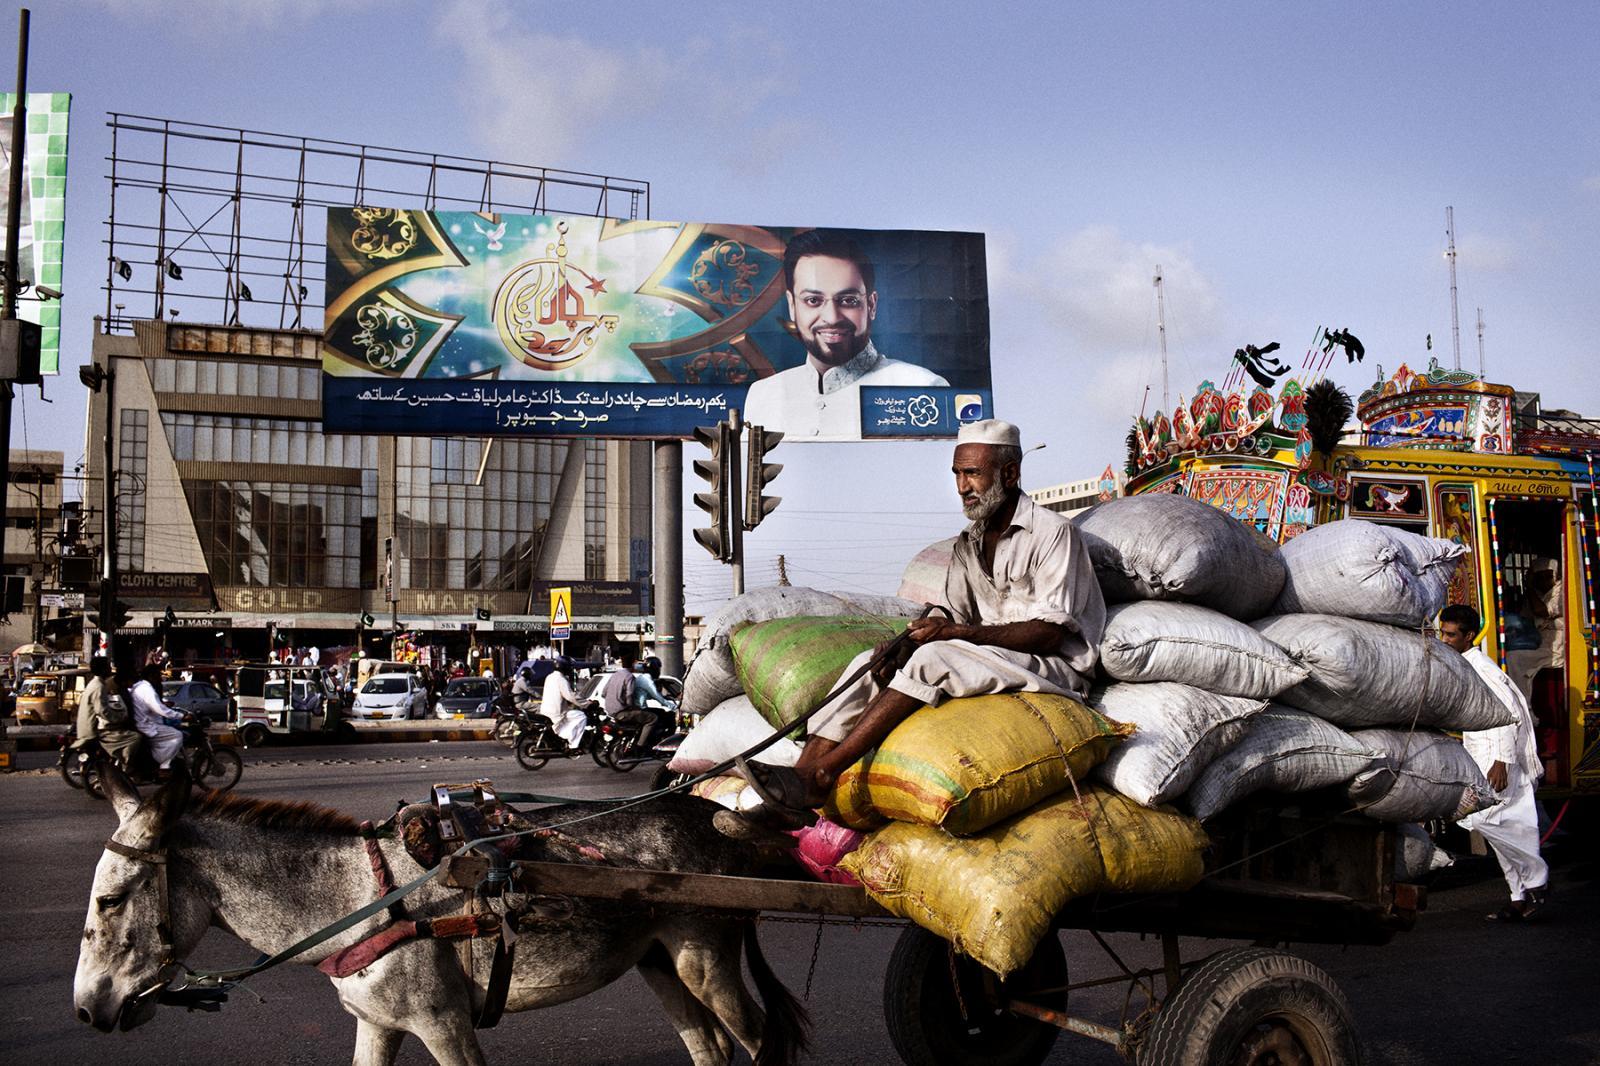 Photography image - Loading Preacher-Pakistan-NYT_02.jpg